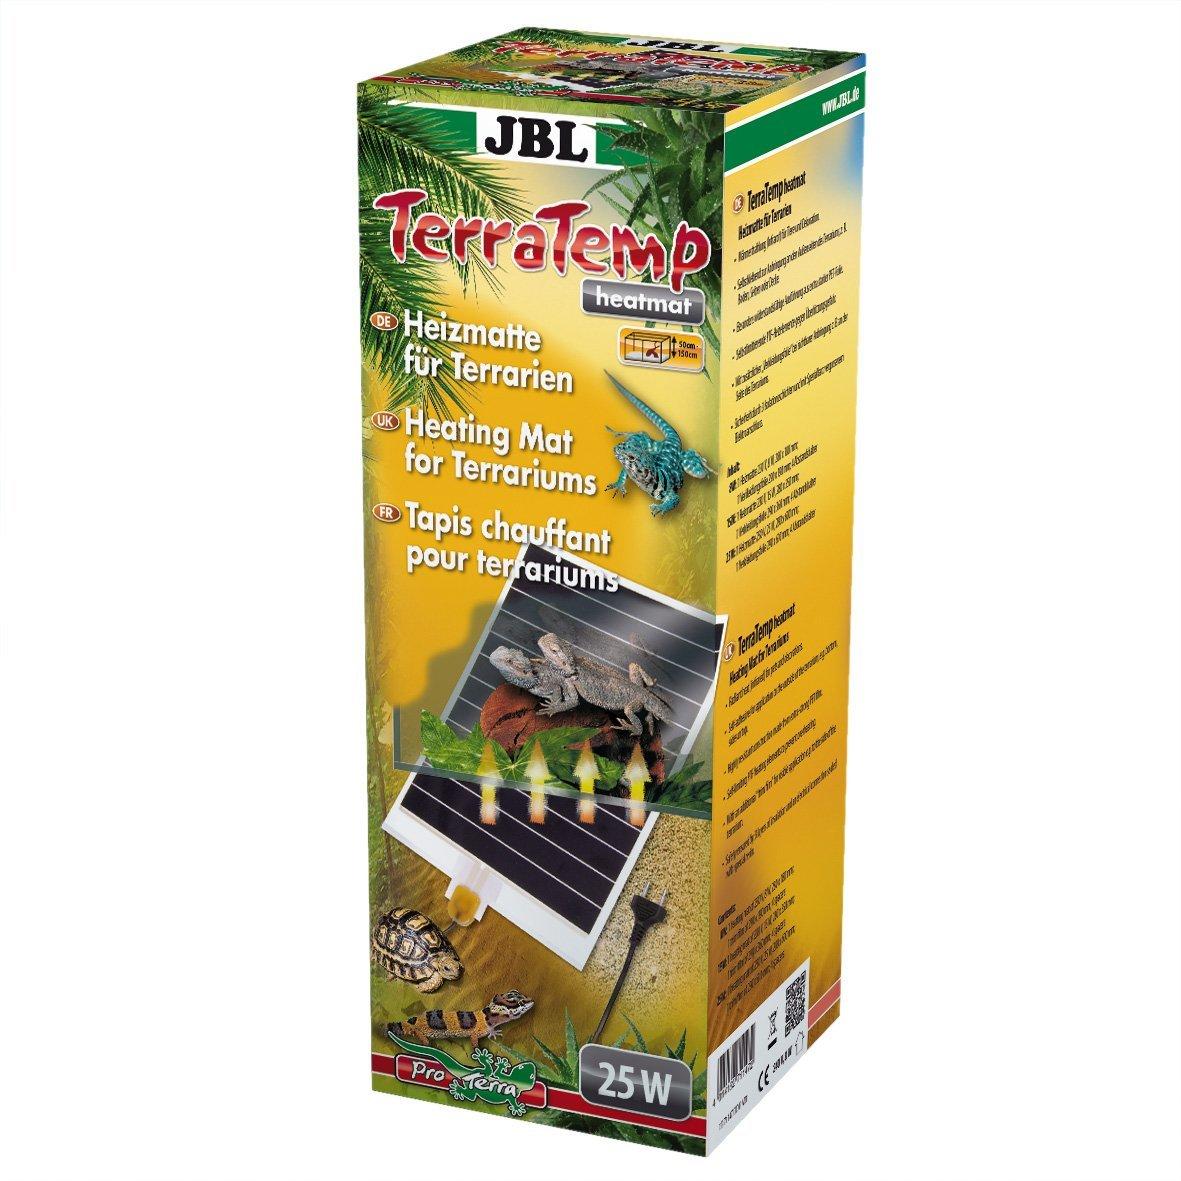 JBL TerraTemp heatmat 15W, Tapis chauffant pour terrarium 7114800